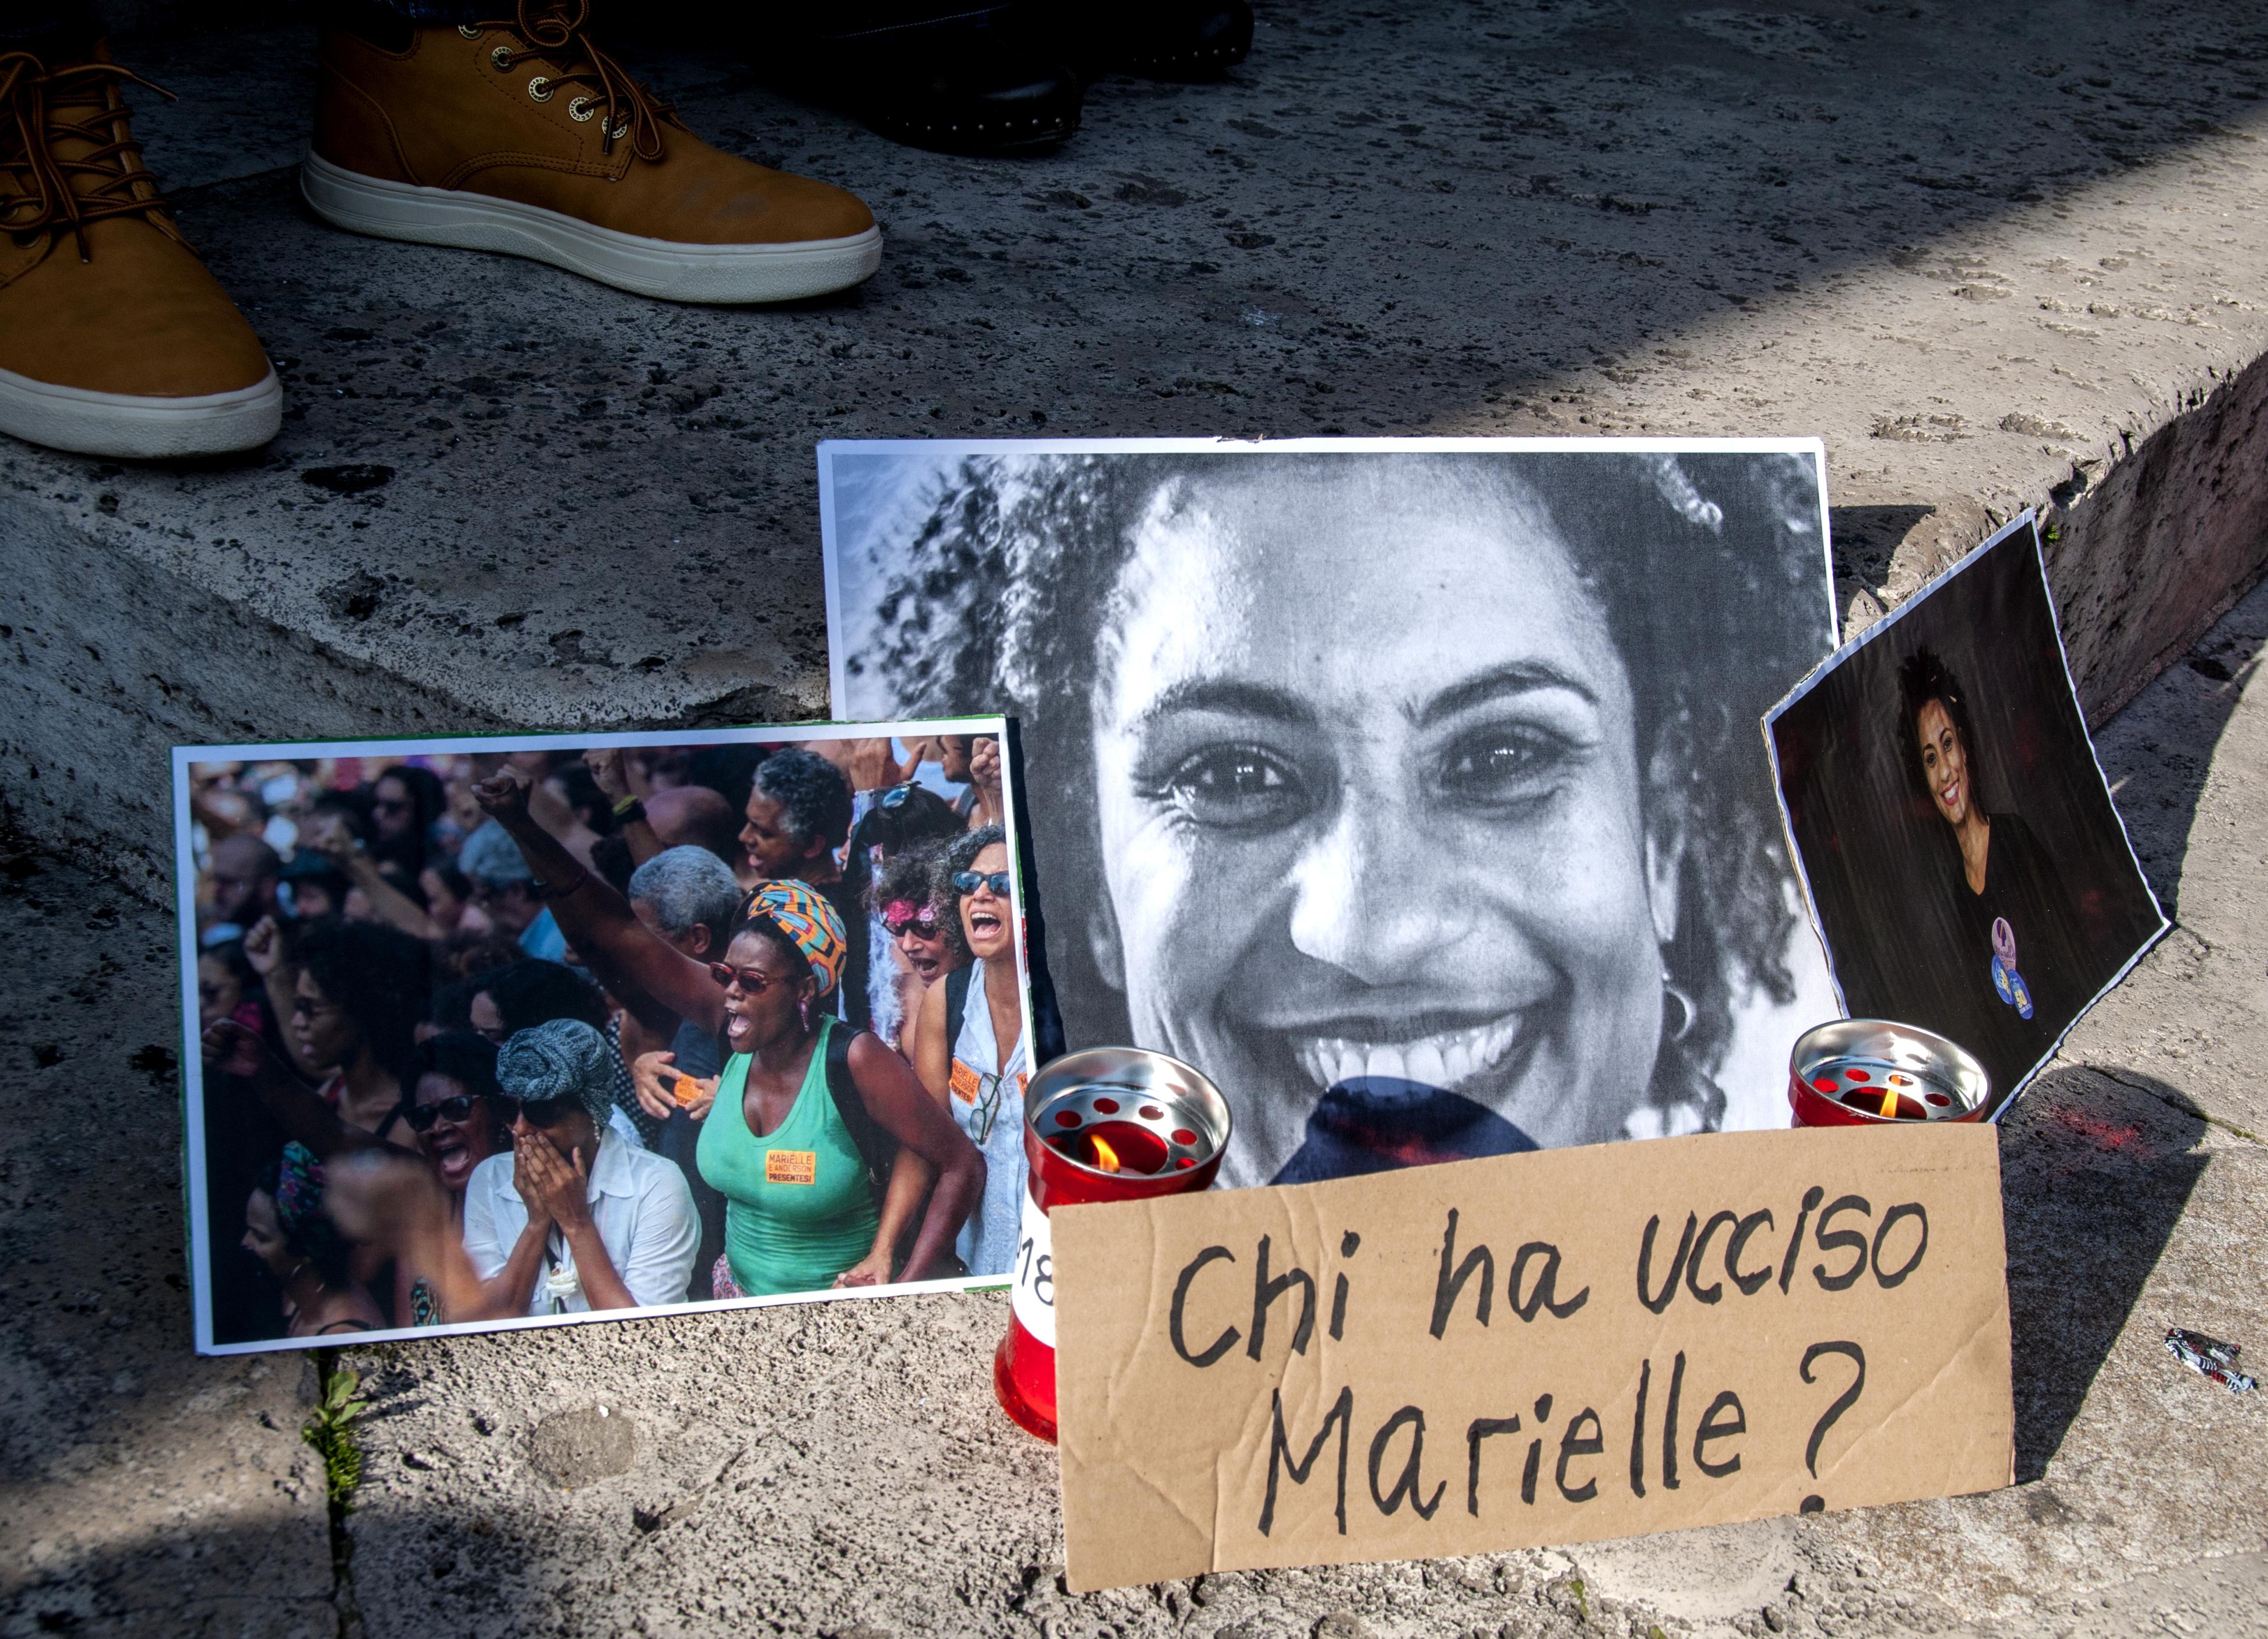 Murielle Franco